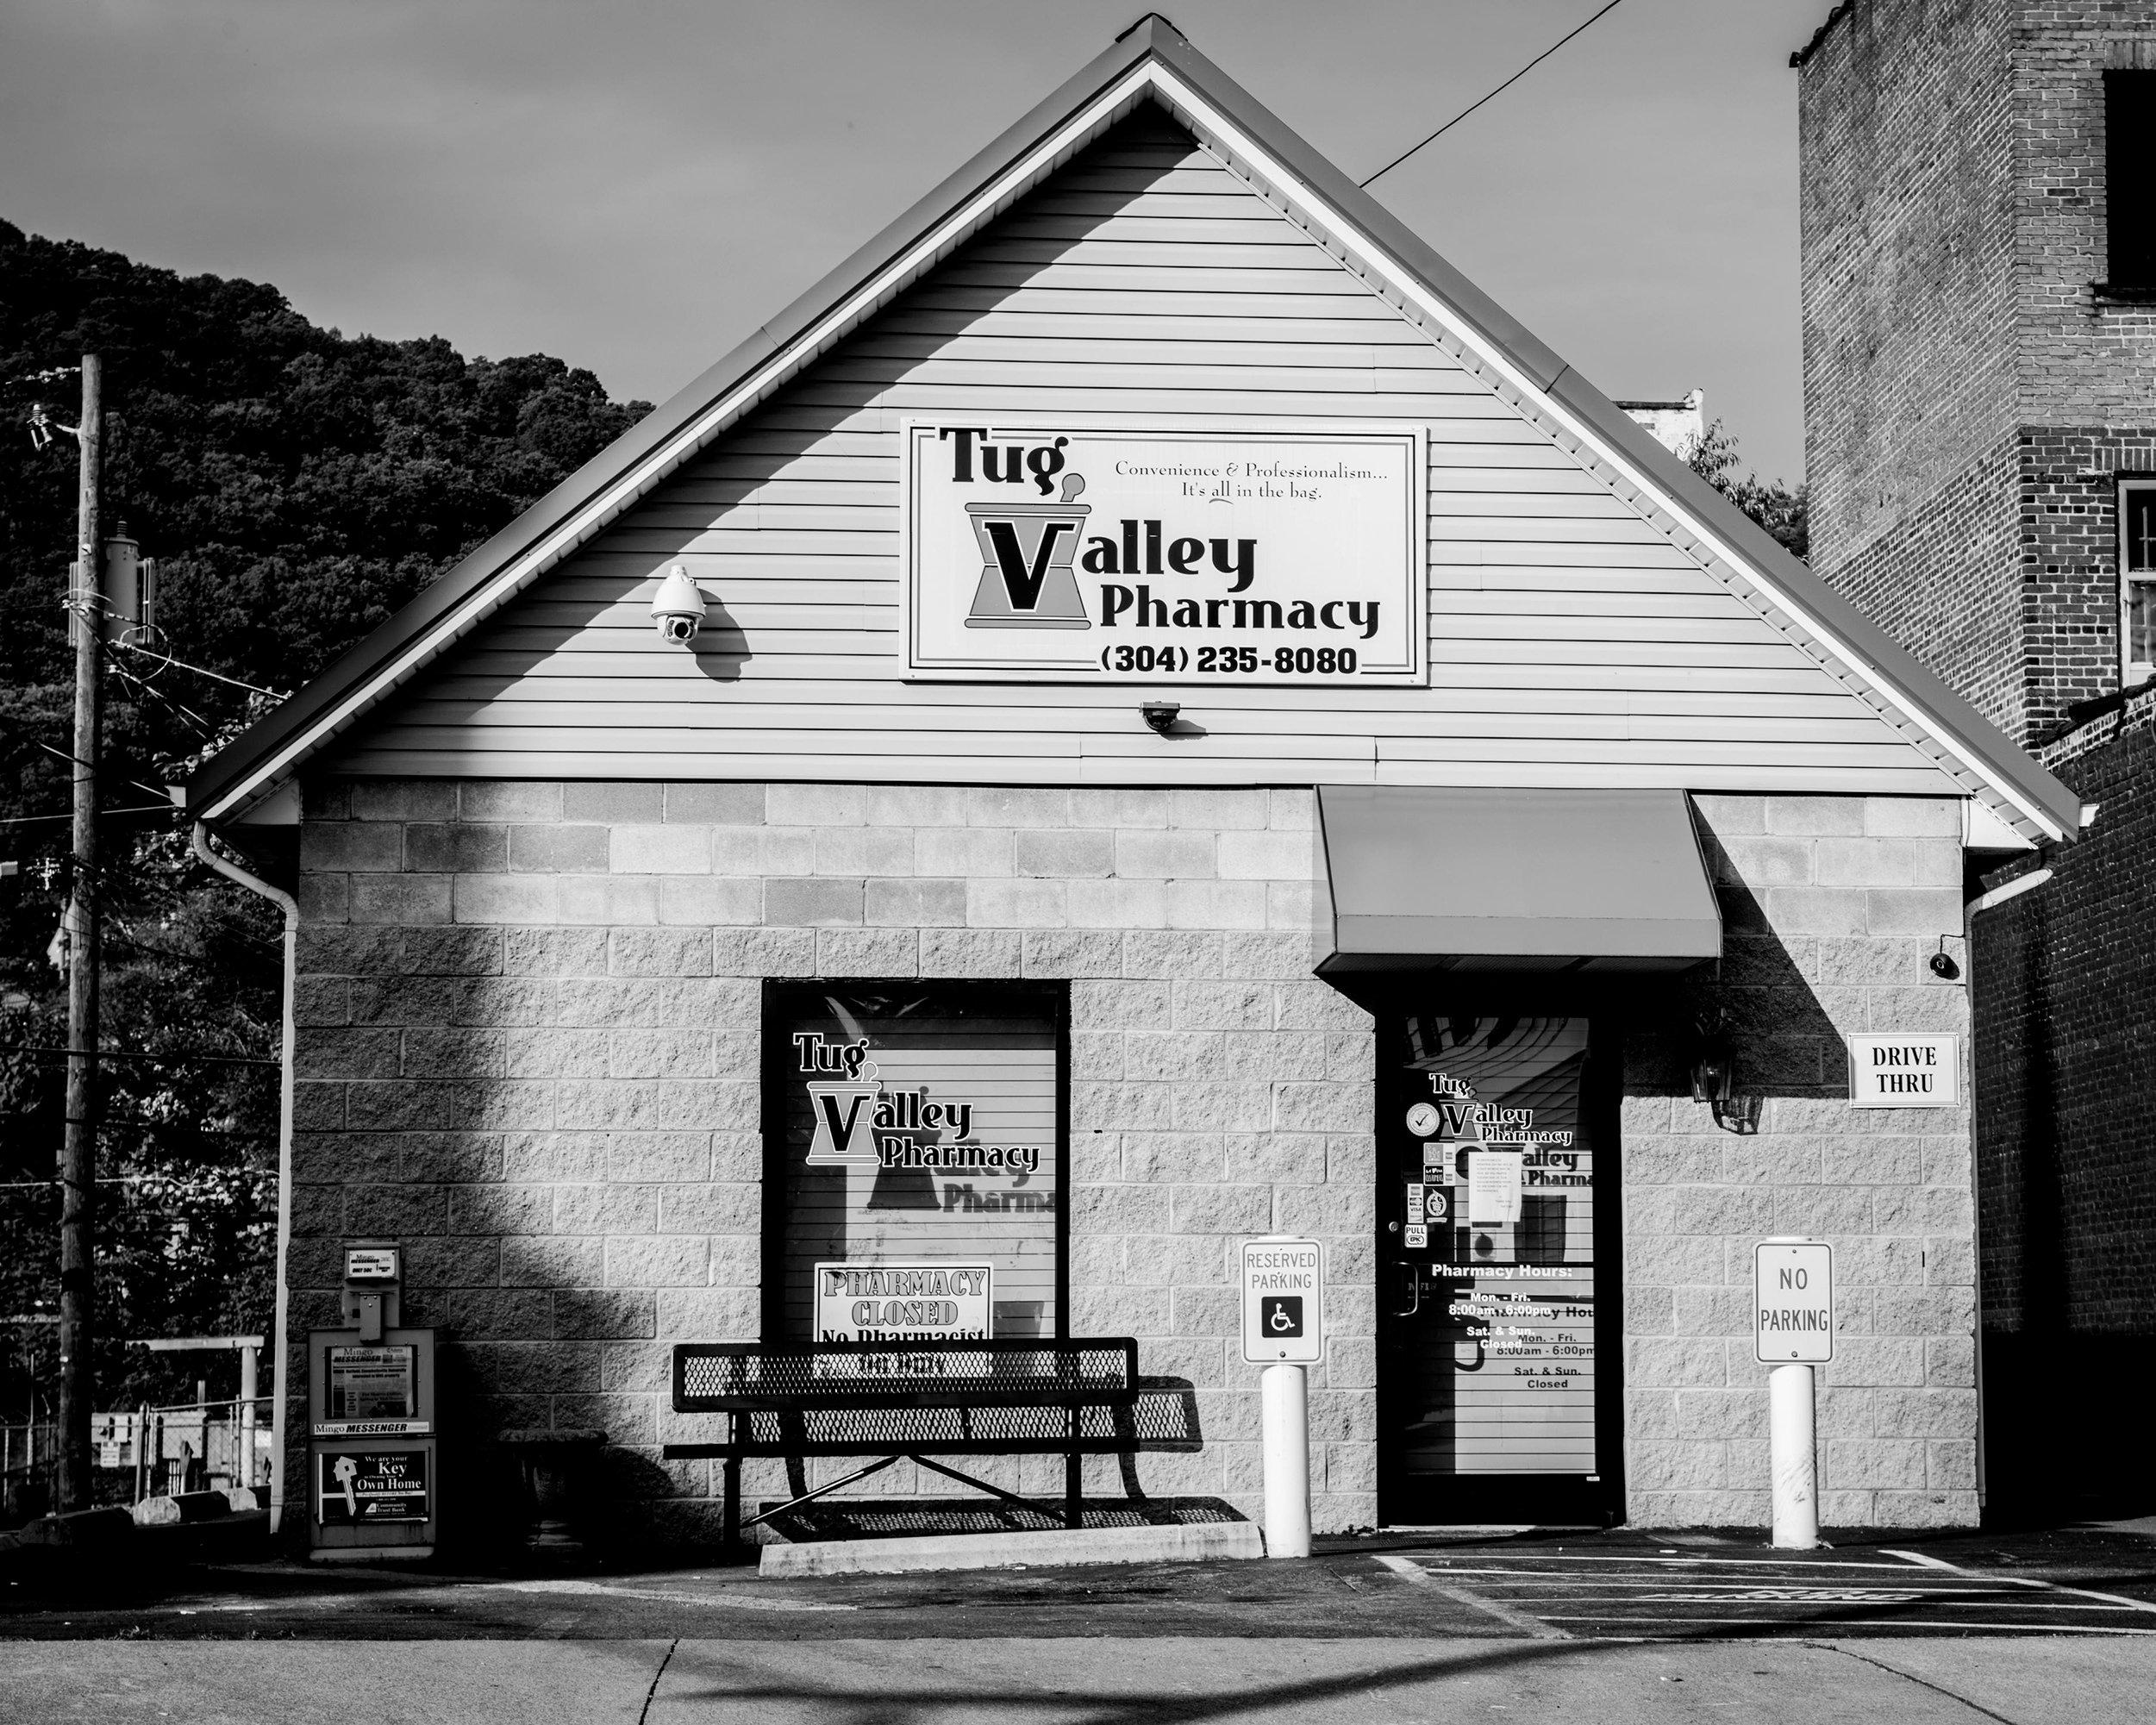 Tug Valley Pharmacy